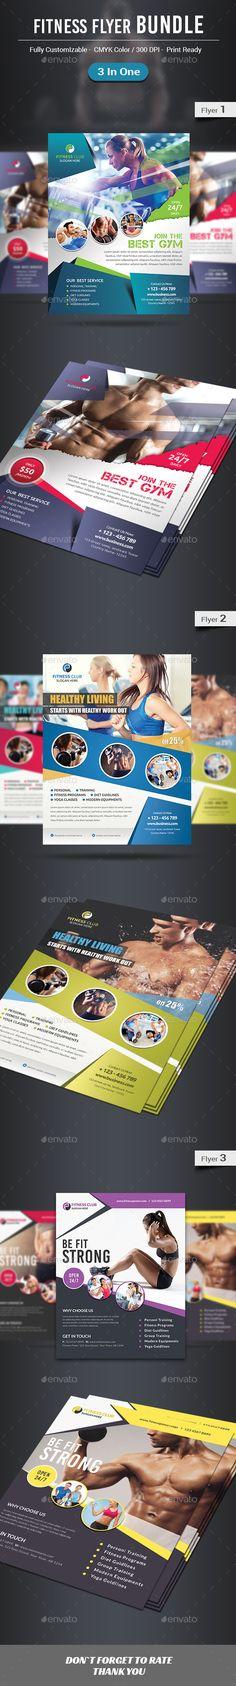 Fitness Flyer Bundle - Sports Events I  PSD - #Club - #Health - #Fitness  #Flyer - #Commerce  I Download: https://graphicriver.net/item/fitness-flyer-bundle/13201669?ref=jpixel55